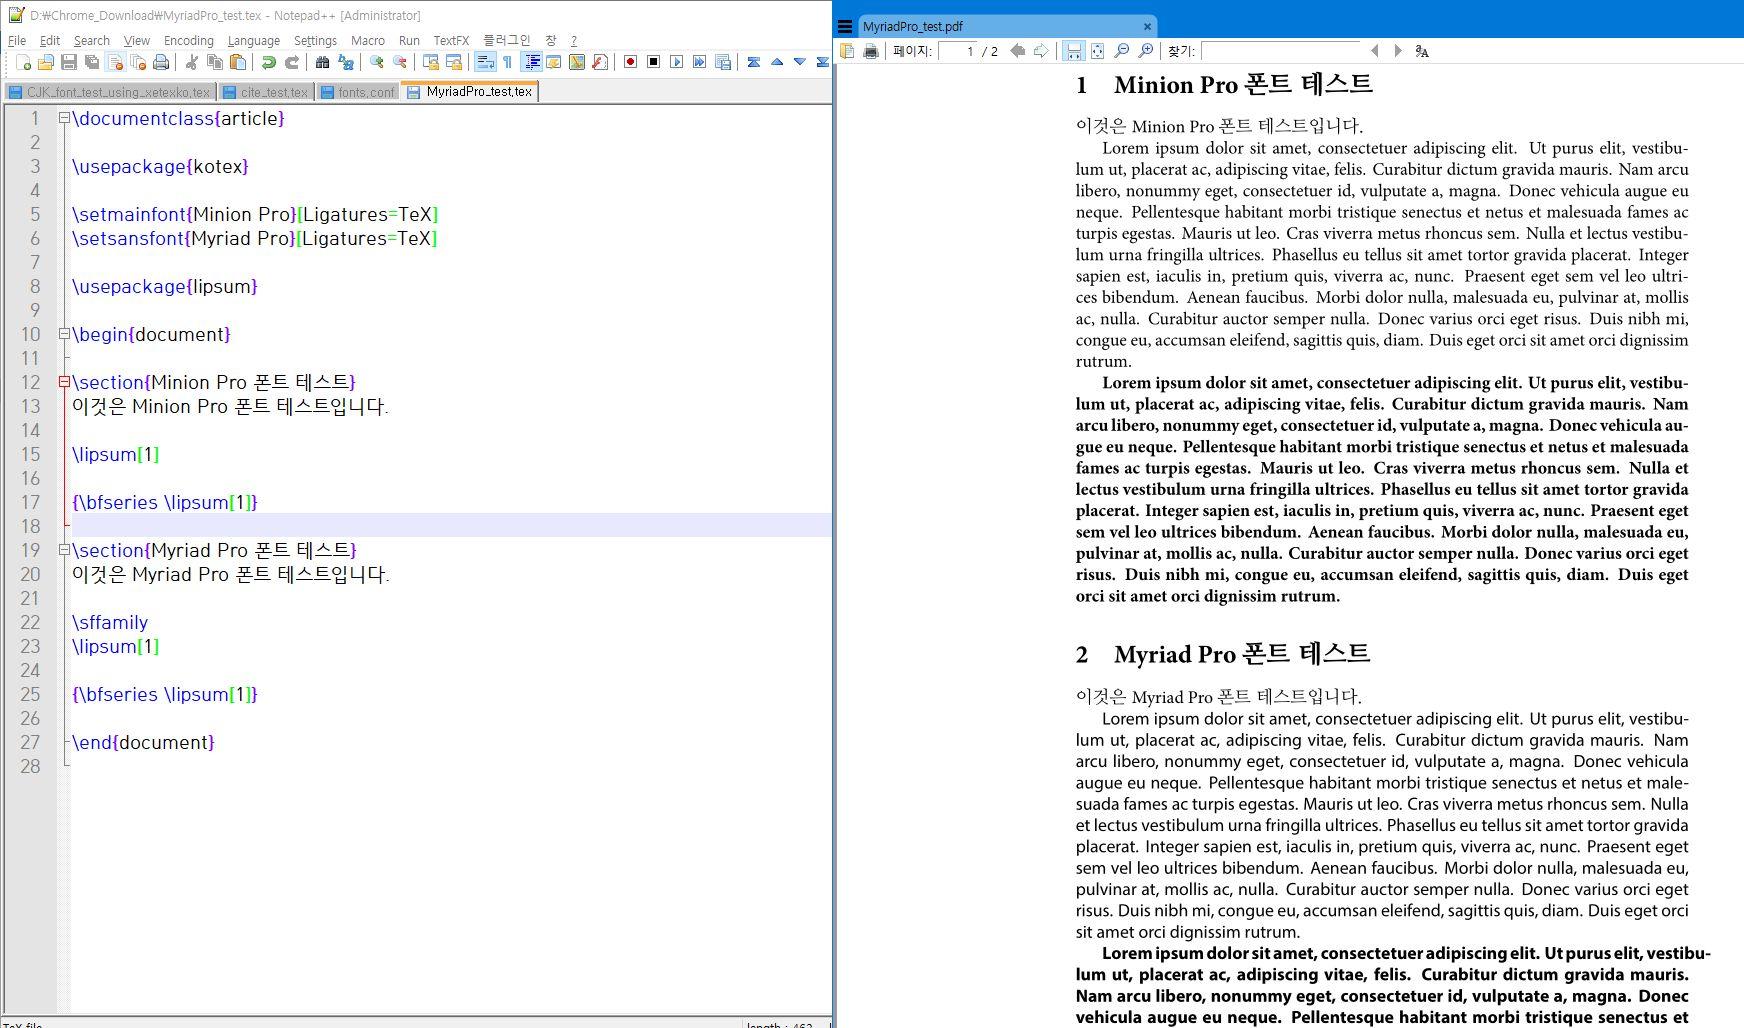 MinionPro_and_MyriadPro_test.jpg